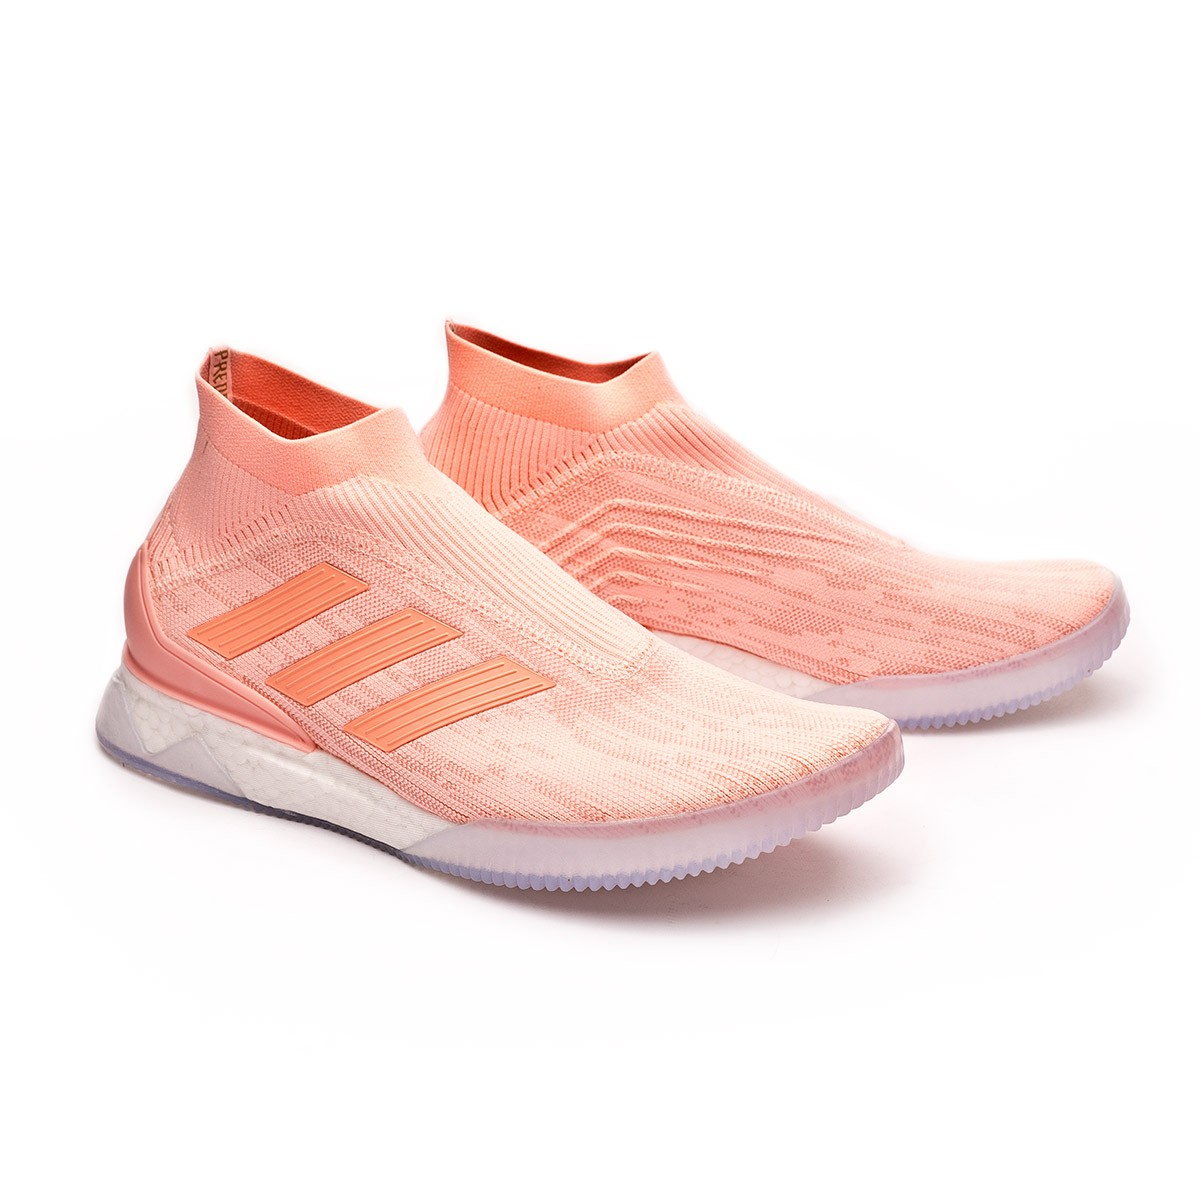 f7907ad6918b Trainers adidas Predator Tango 18+ TR Clear orange-Trace pink ...